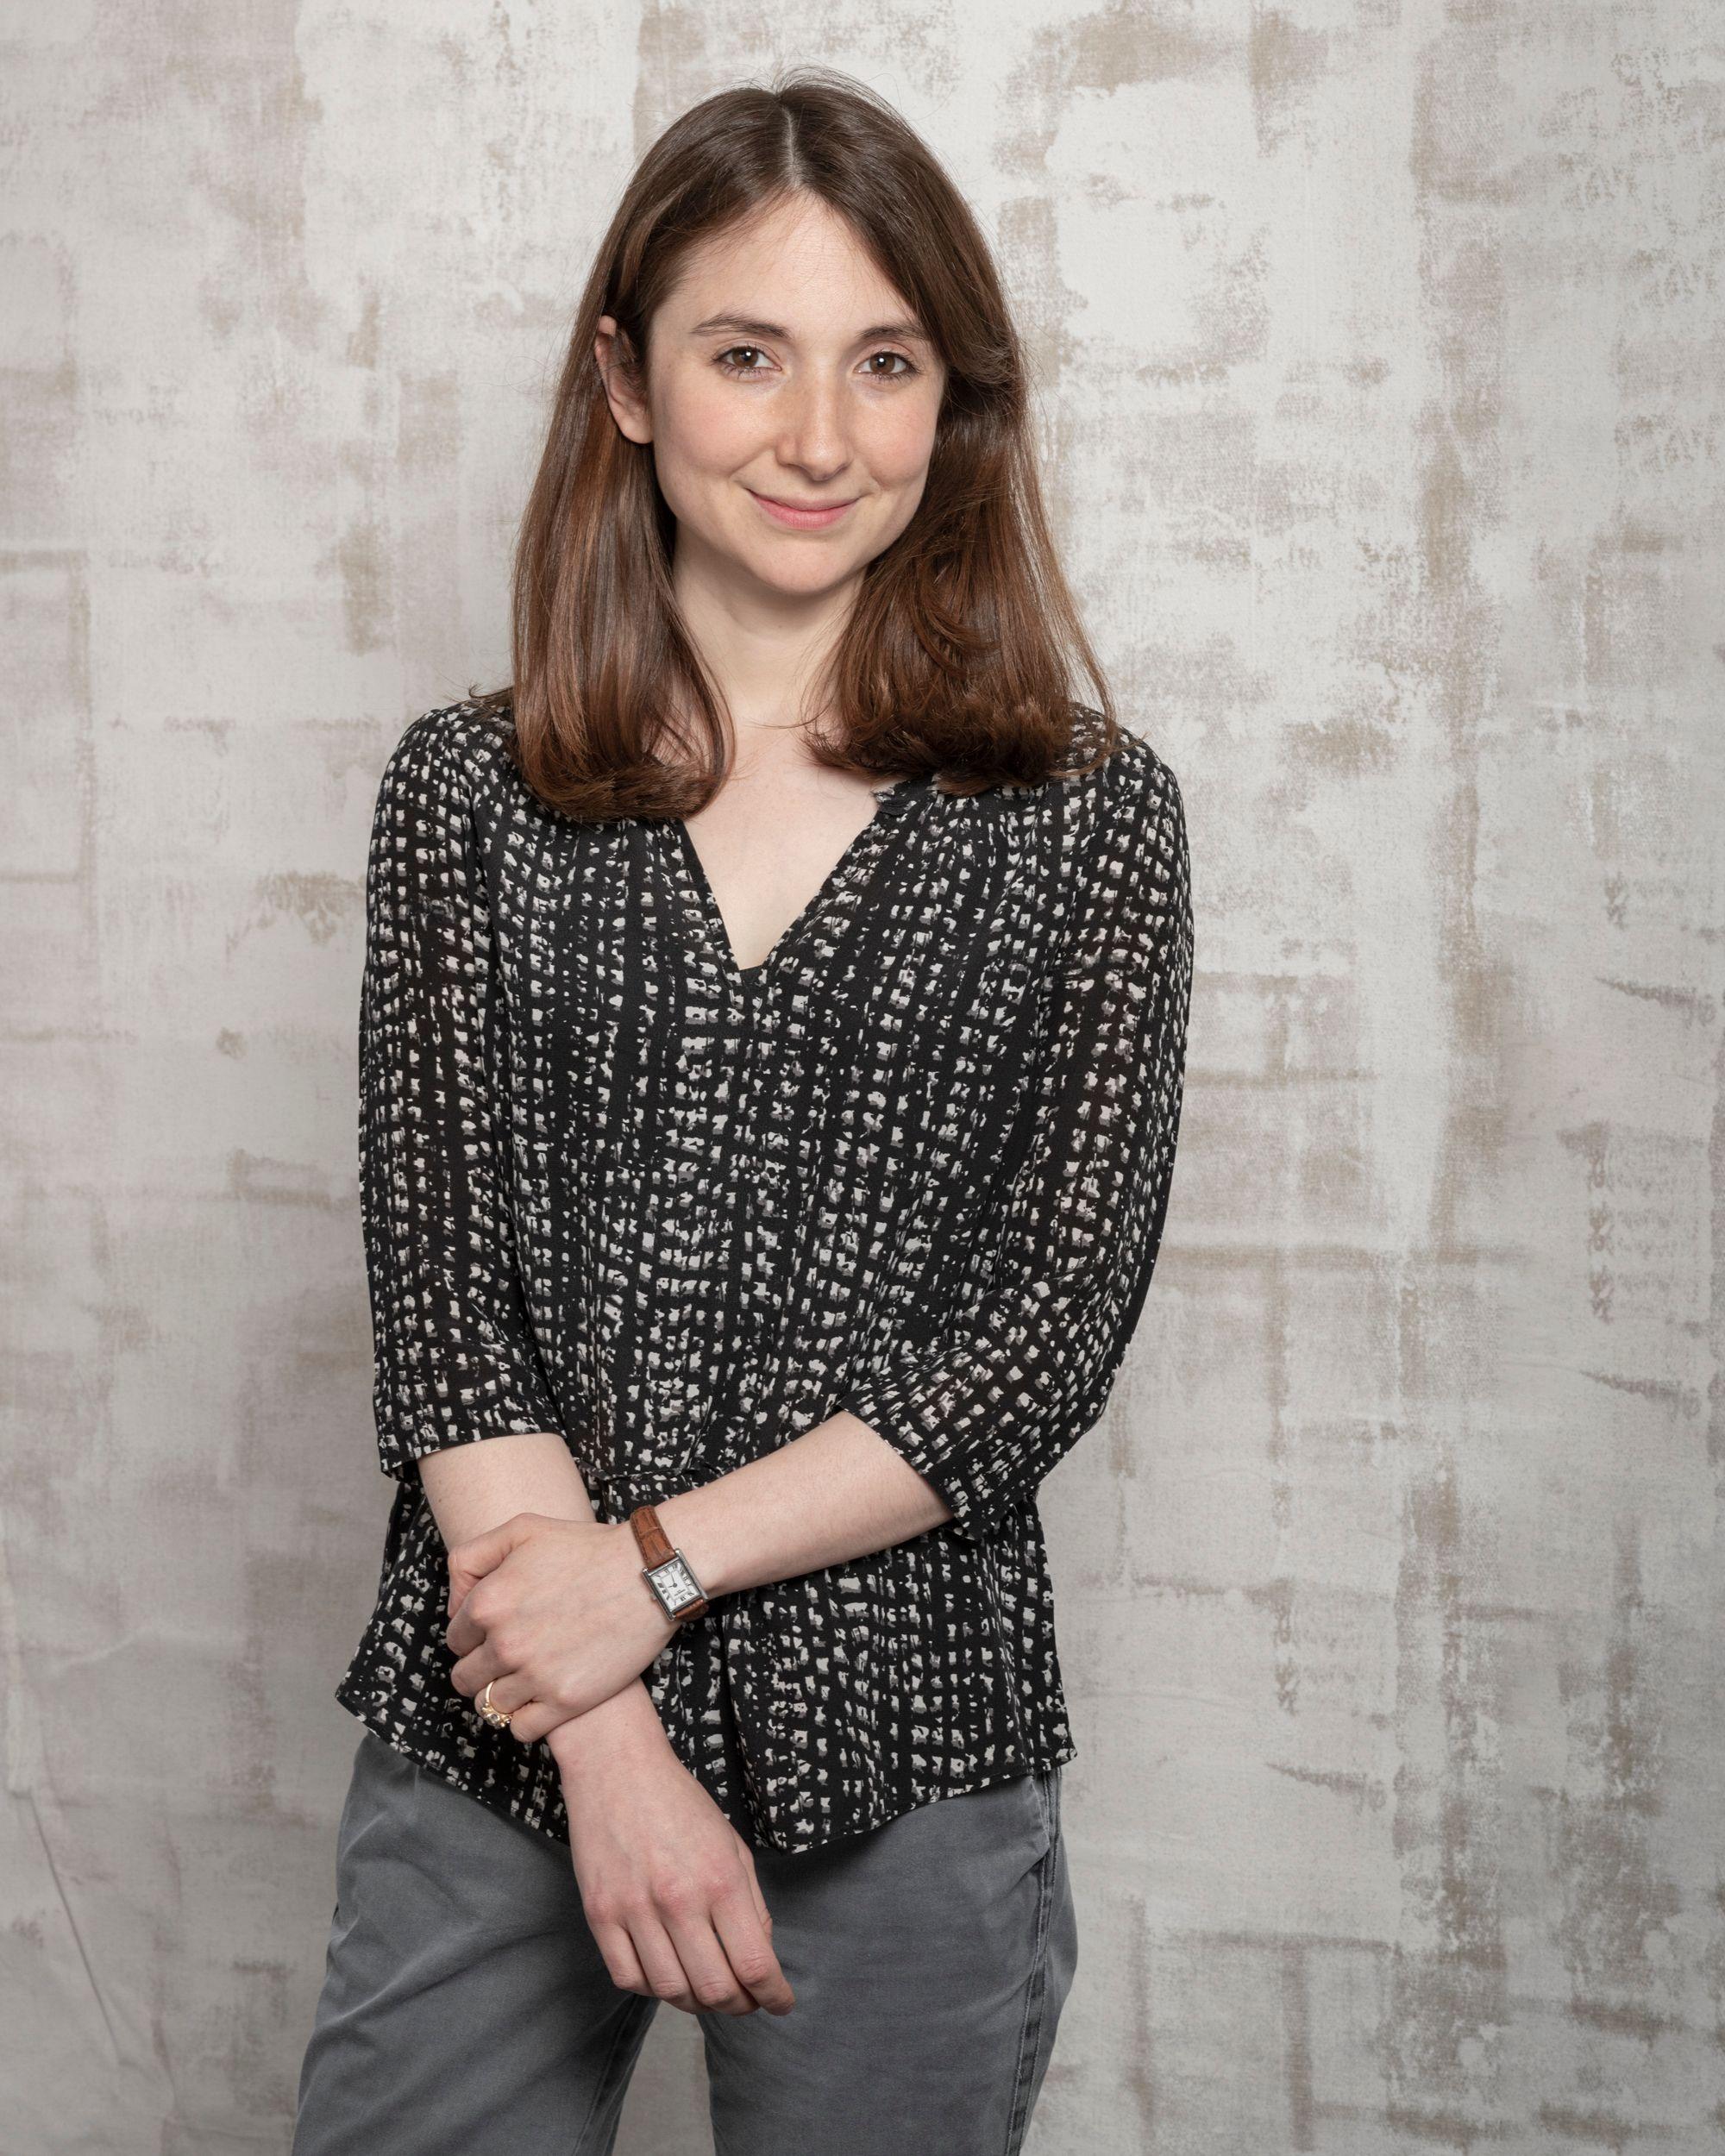 Laura Freeman